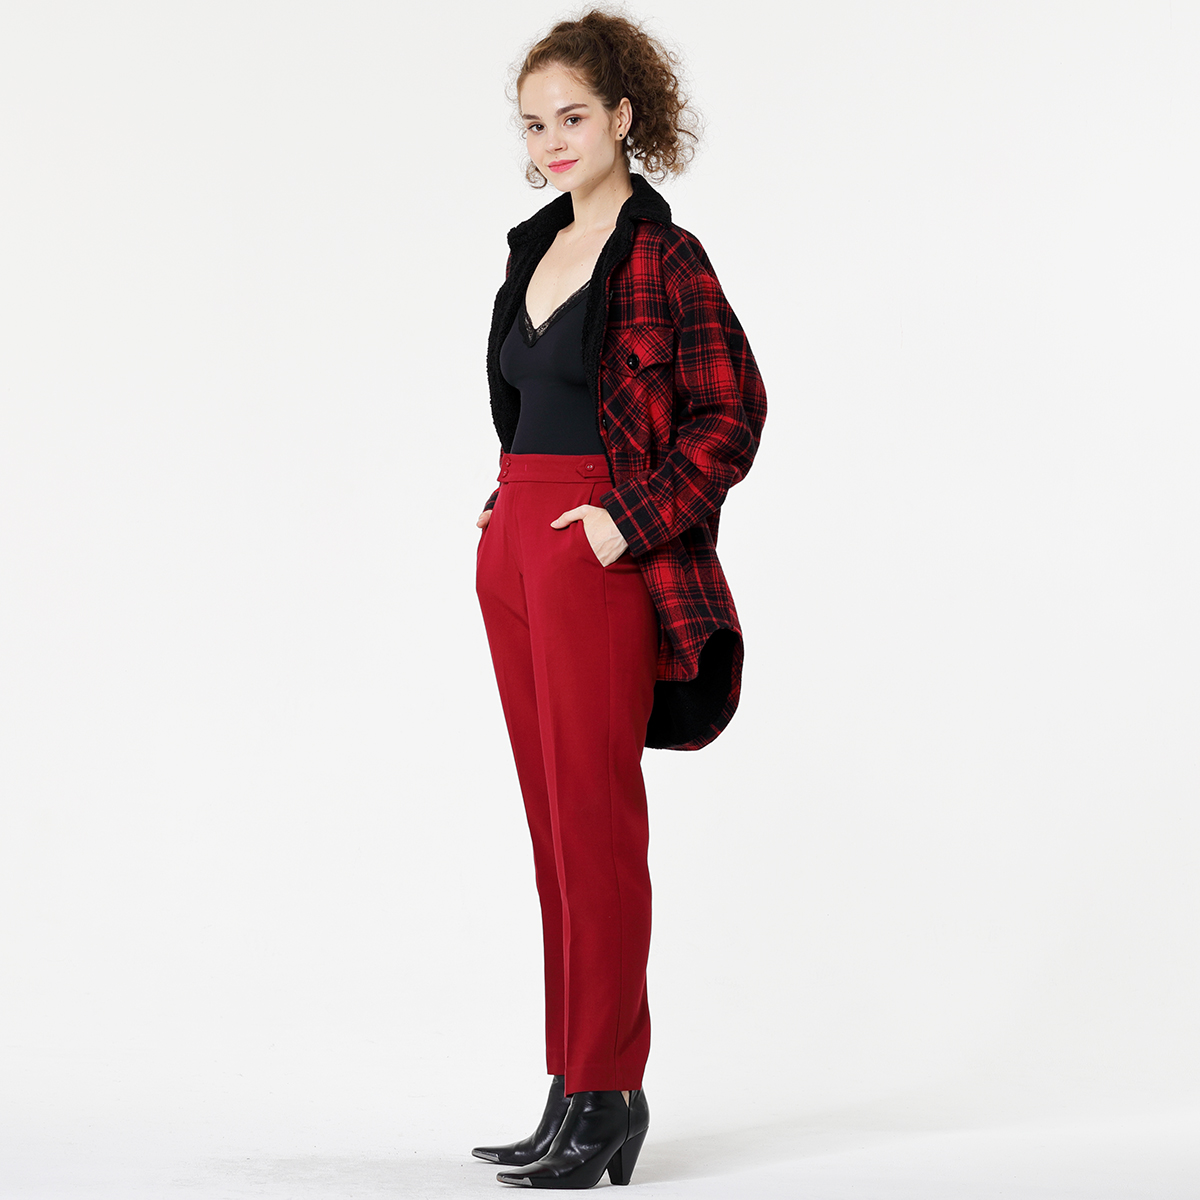 Women's casual pants